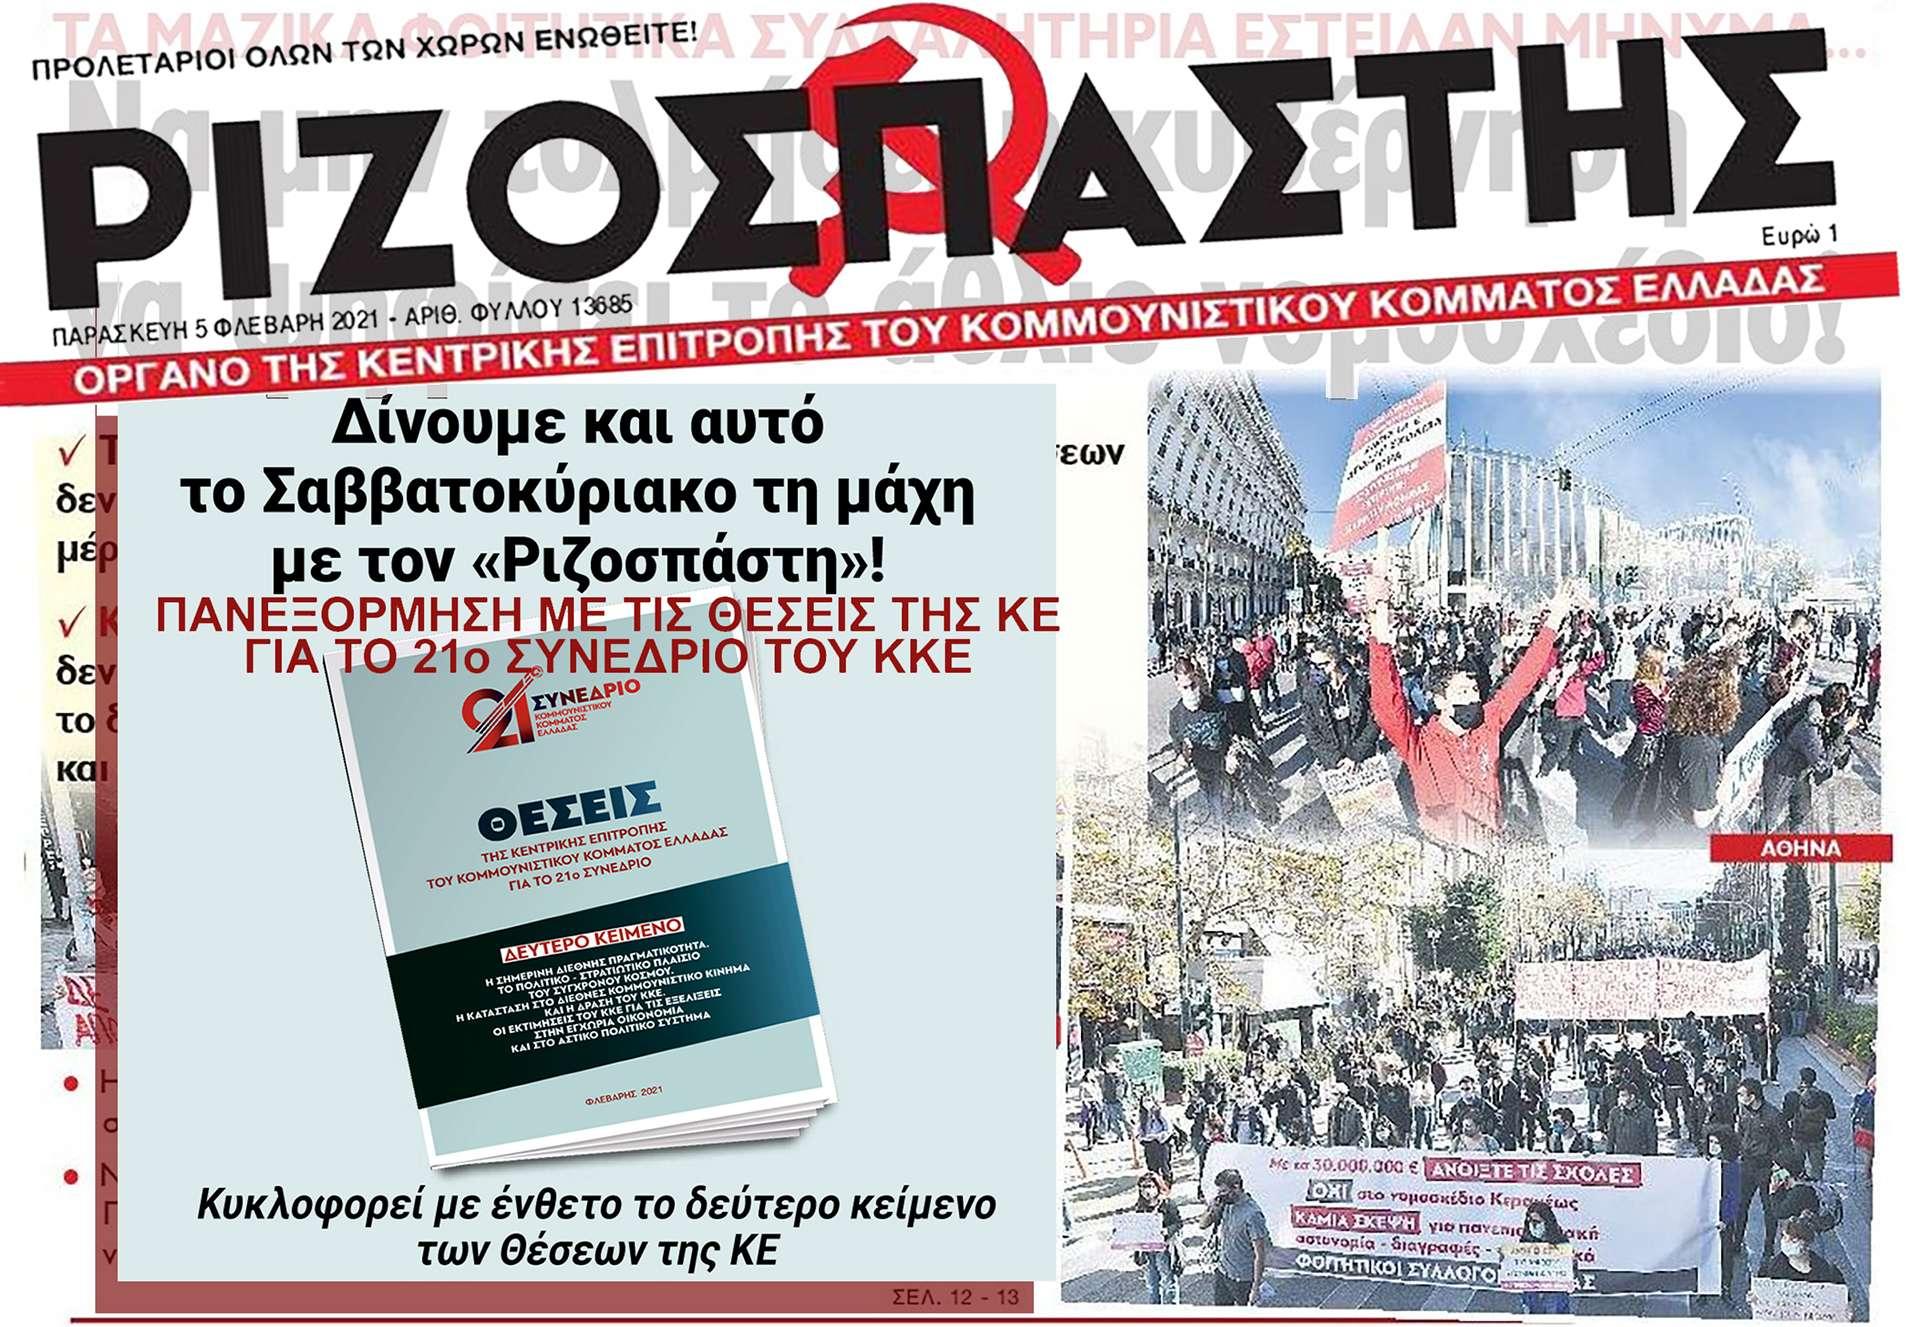 KKE 21 SYNEDRIO Συνέδριο Ρίζος Rizos theseis Θέσεις 2